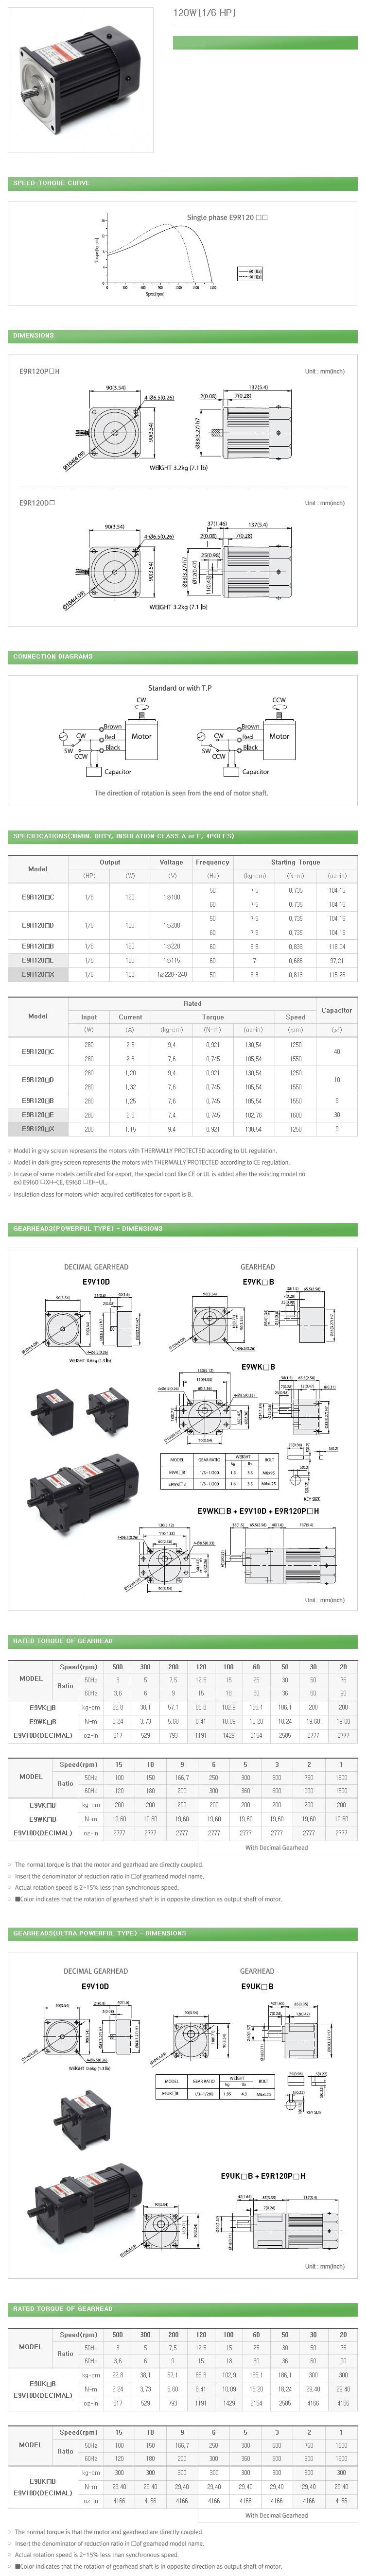 DAEHWA E/M Reversible Motor (120W, 1/6 HP)